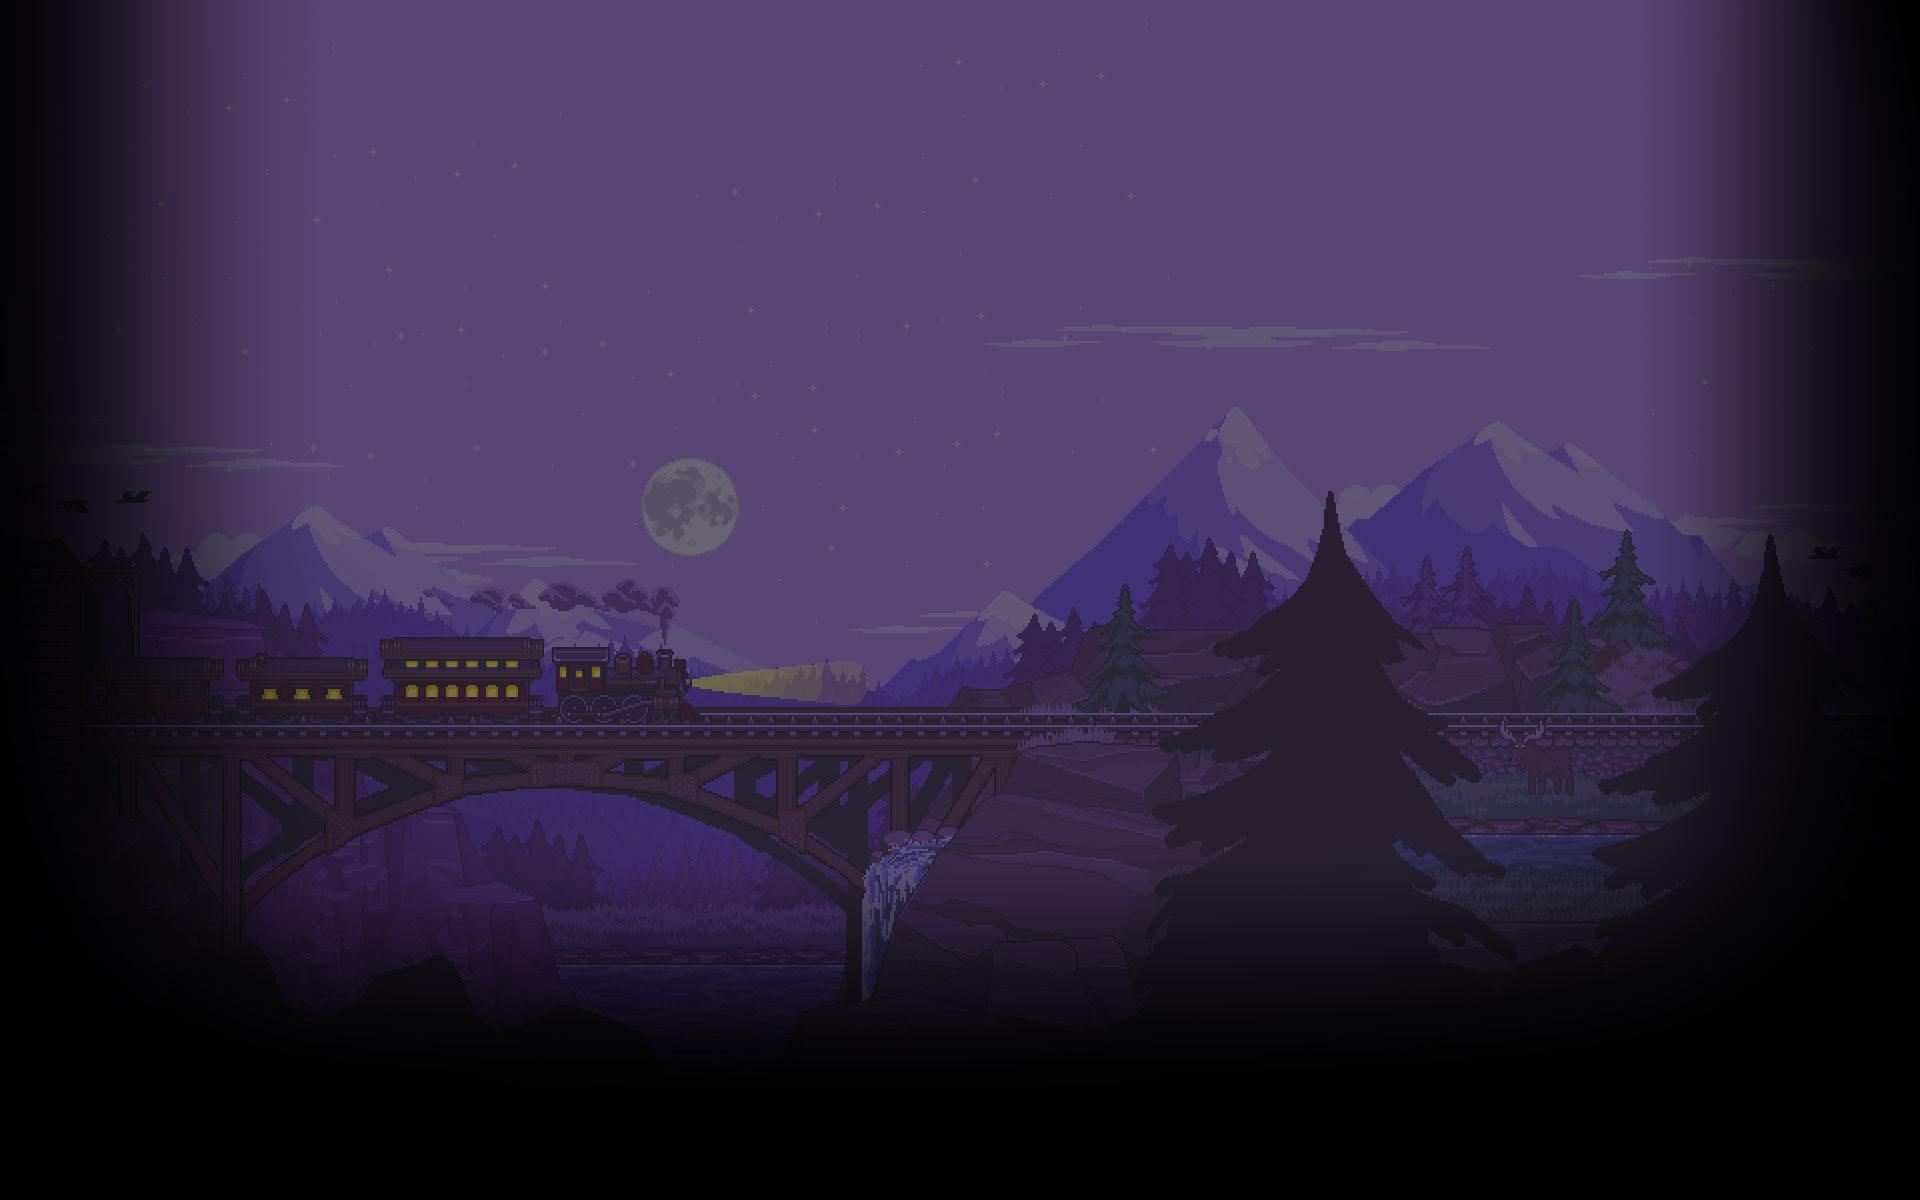 Pubg Neon Wallpaper: Steam Community :: Guide :: Best Pixel Art Backgrounds